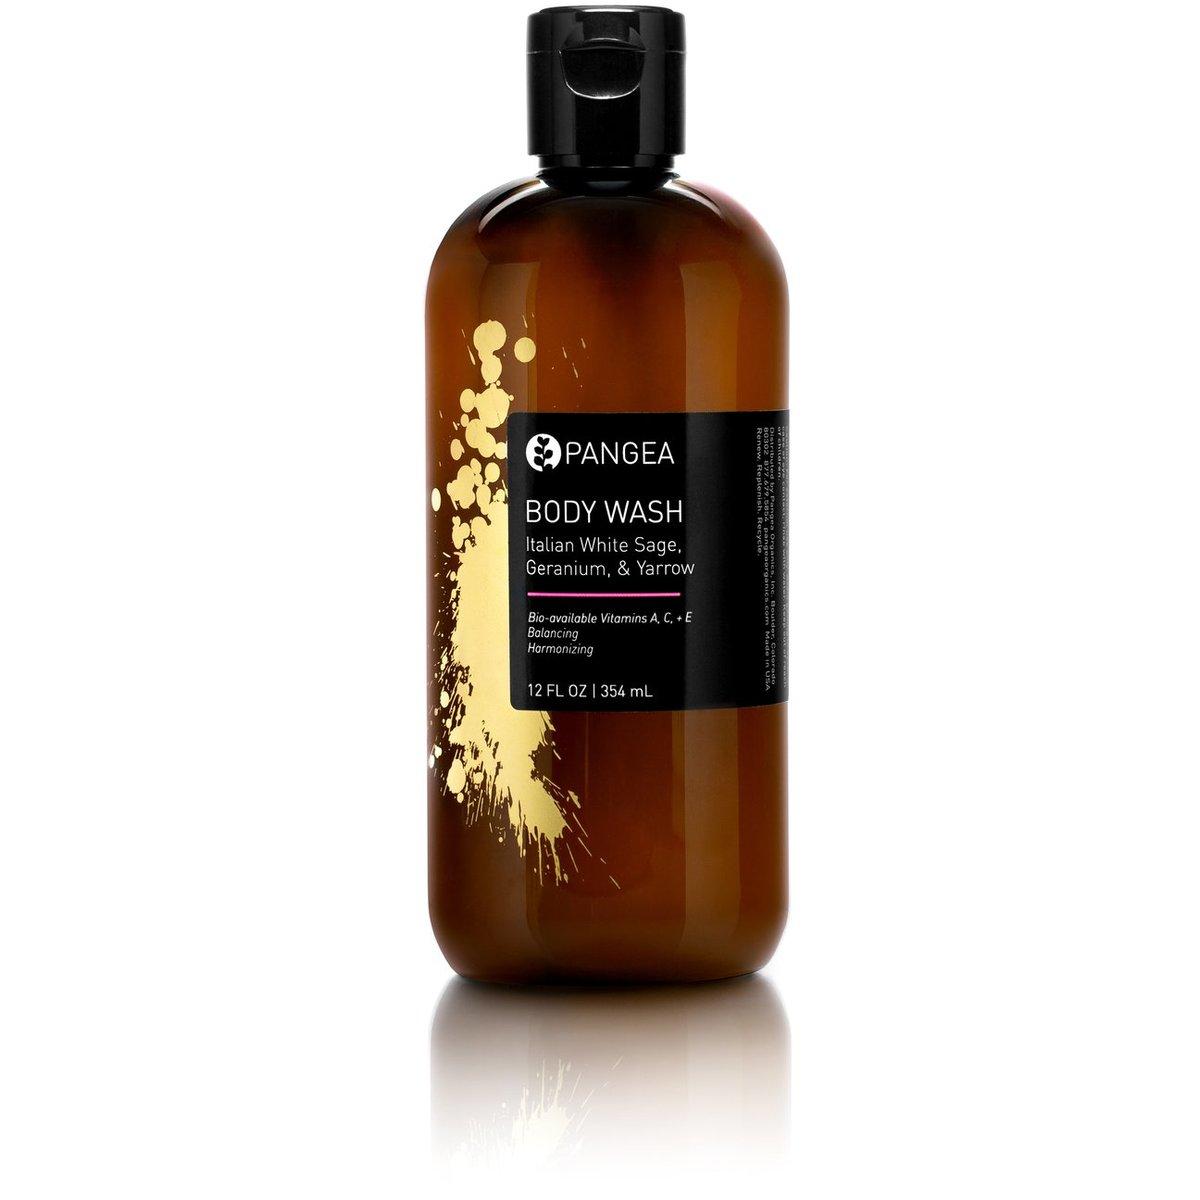 Image of Pangea Organics Body Wash - Italian White Sage, Geranium, & Yarrow